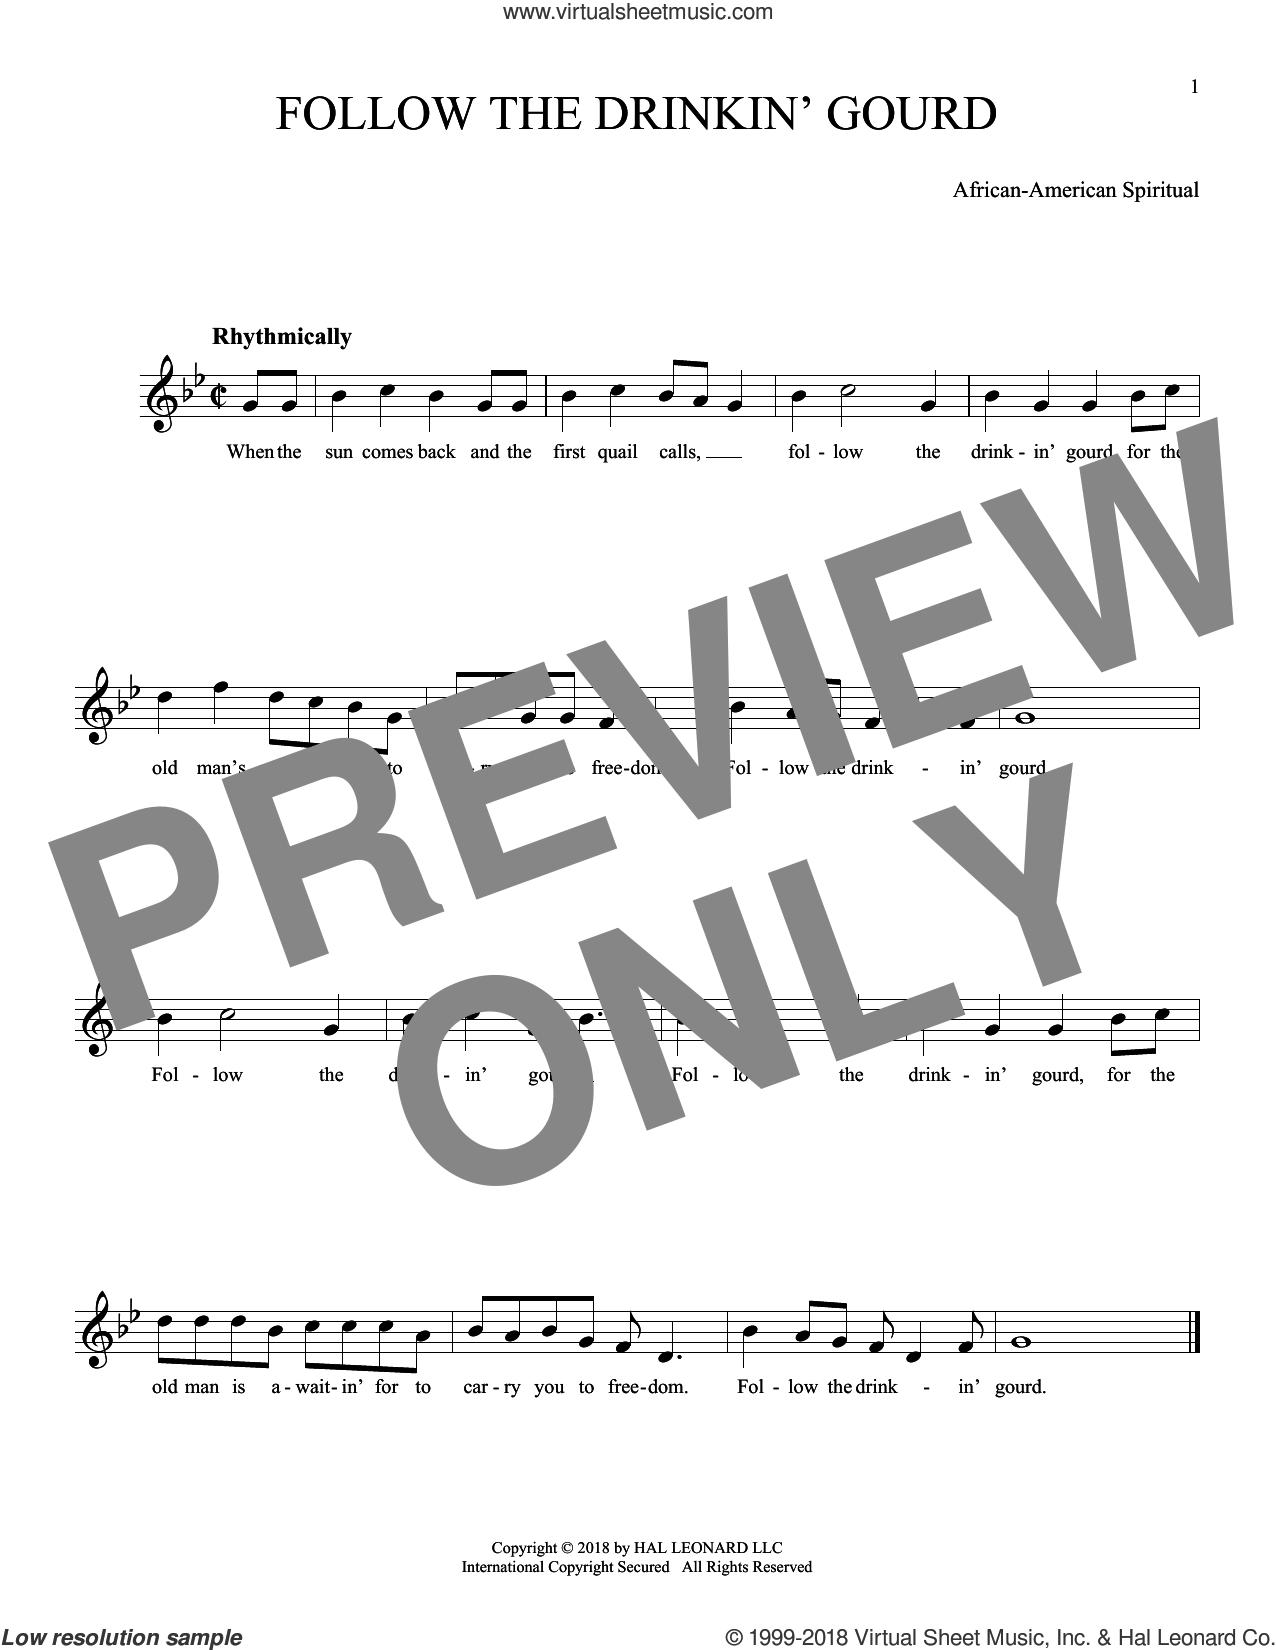 Follow The Drinkin' Gourd sheet music for ocarina solo, intermediate skill level